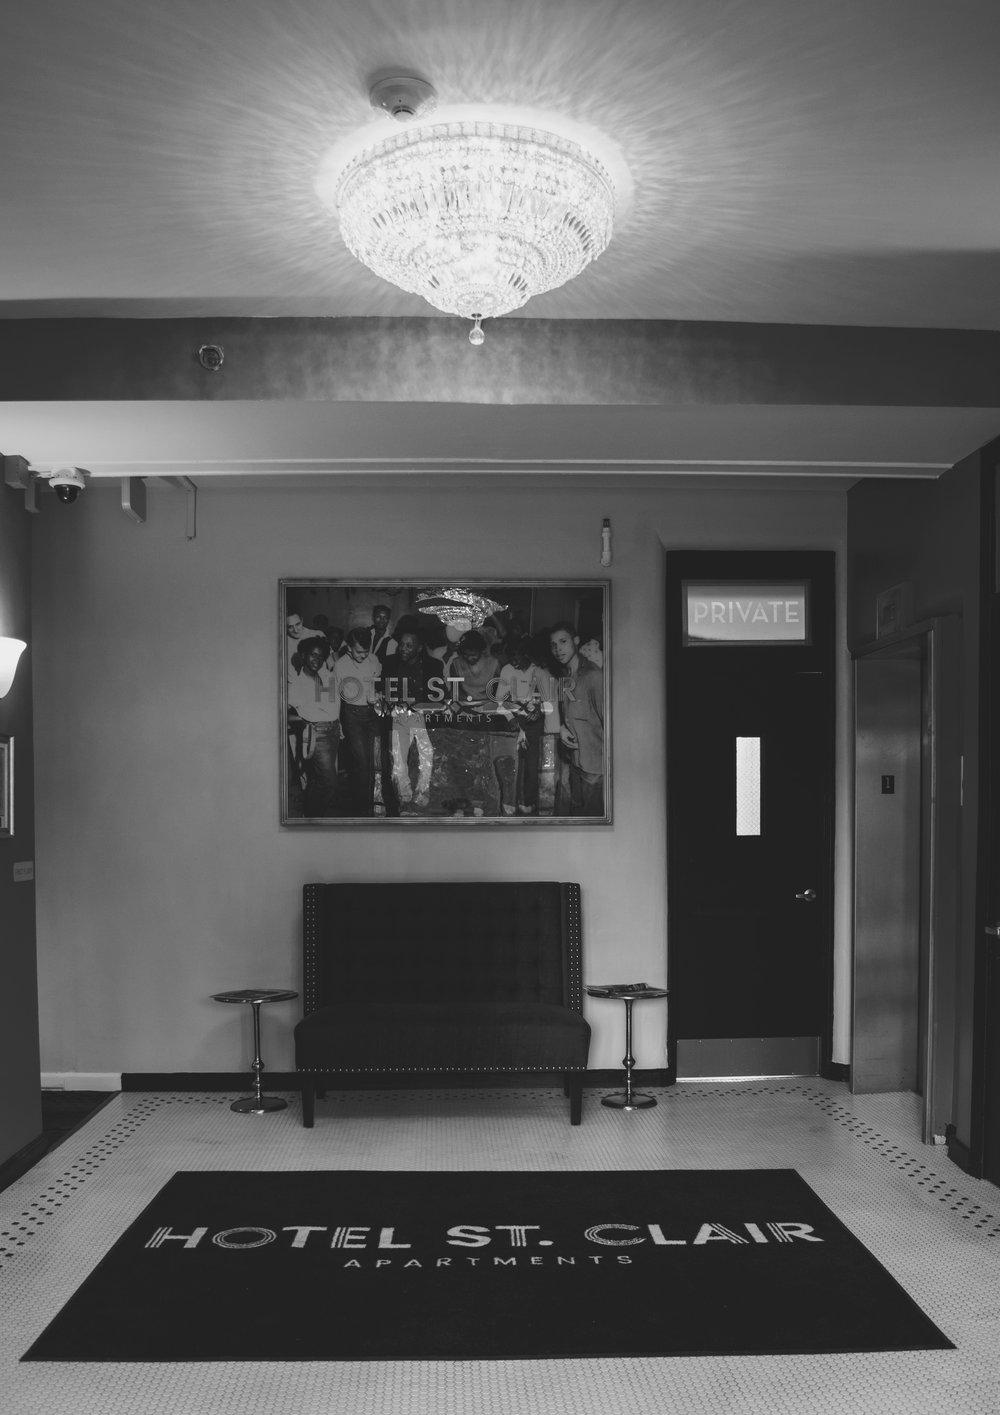 HSC - final lobby 2 (1).jpg